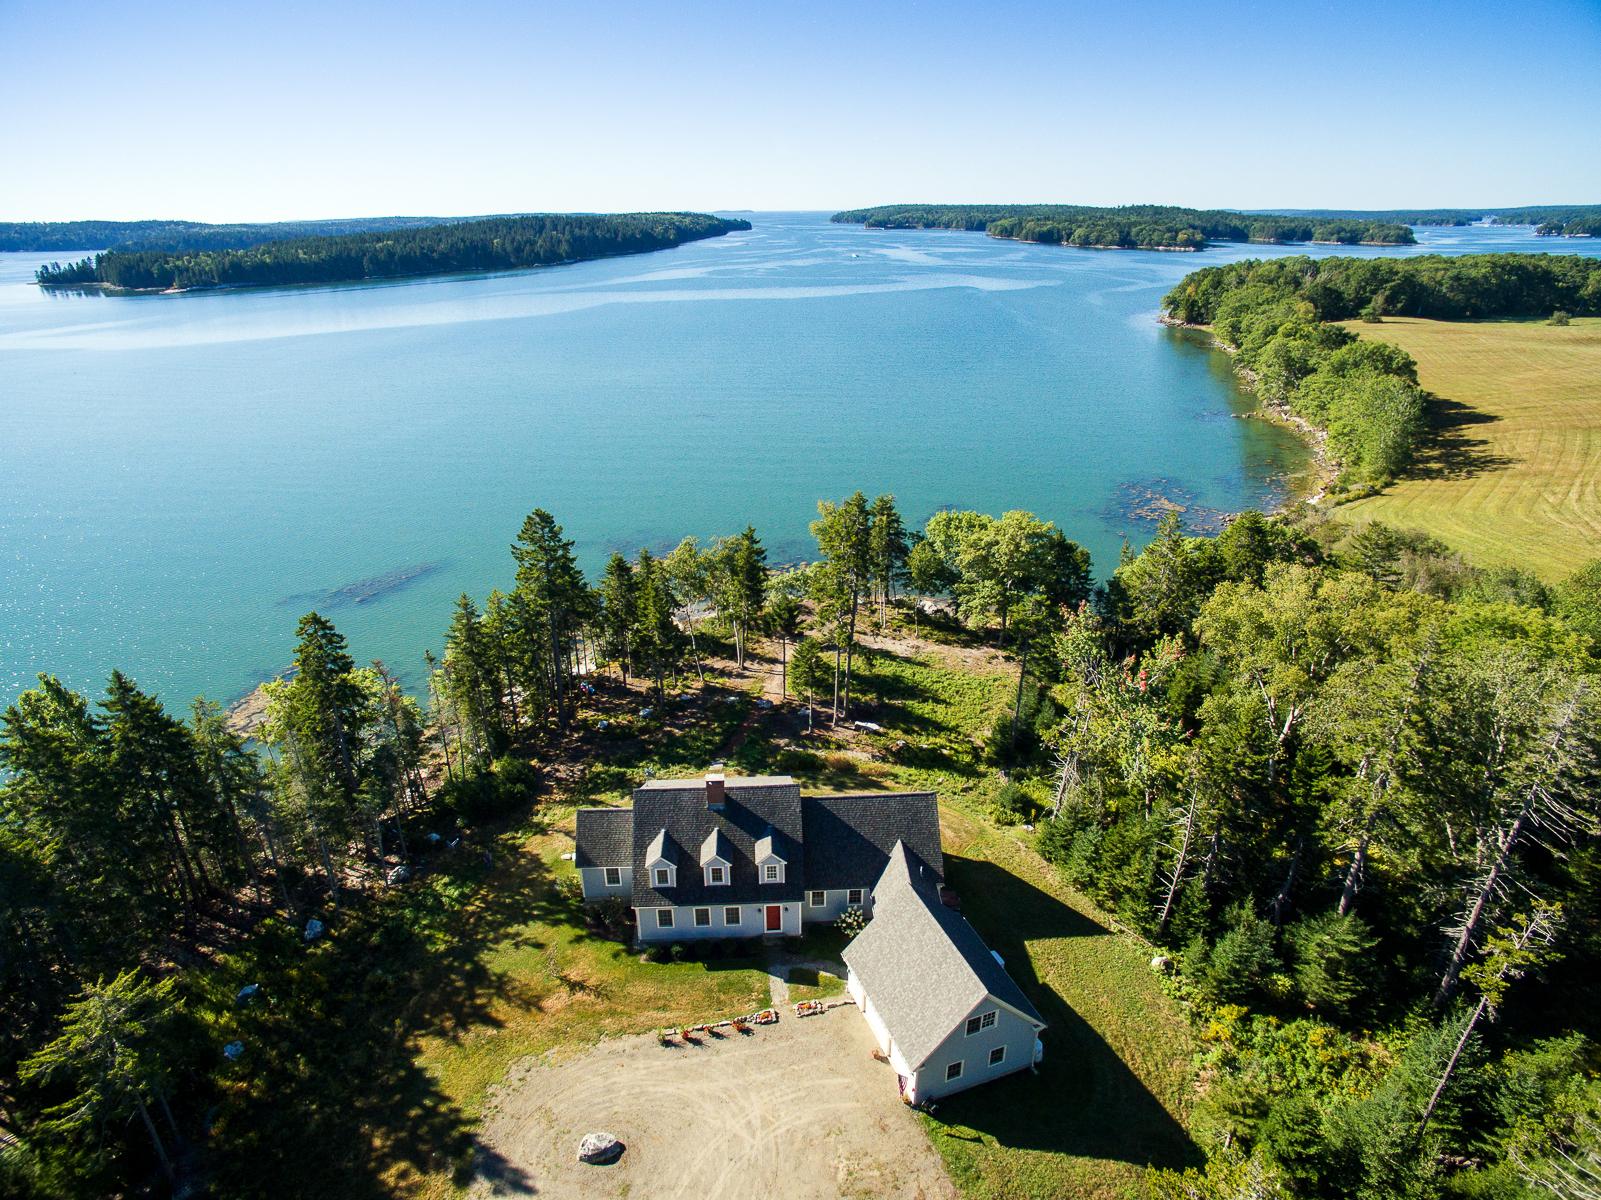 Single Family Home for Sale at 650 Deaver Road, Waldoboro Waldoboro, Maine, 04572 United States